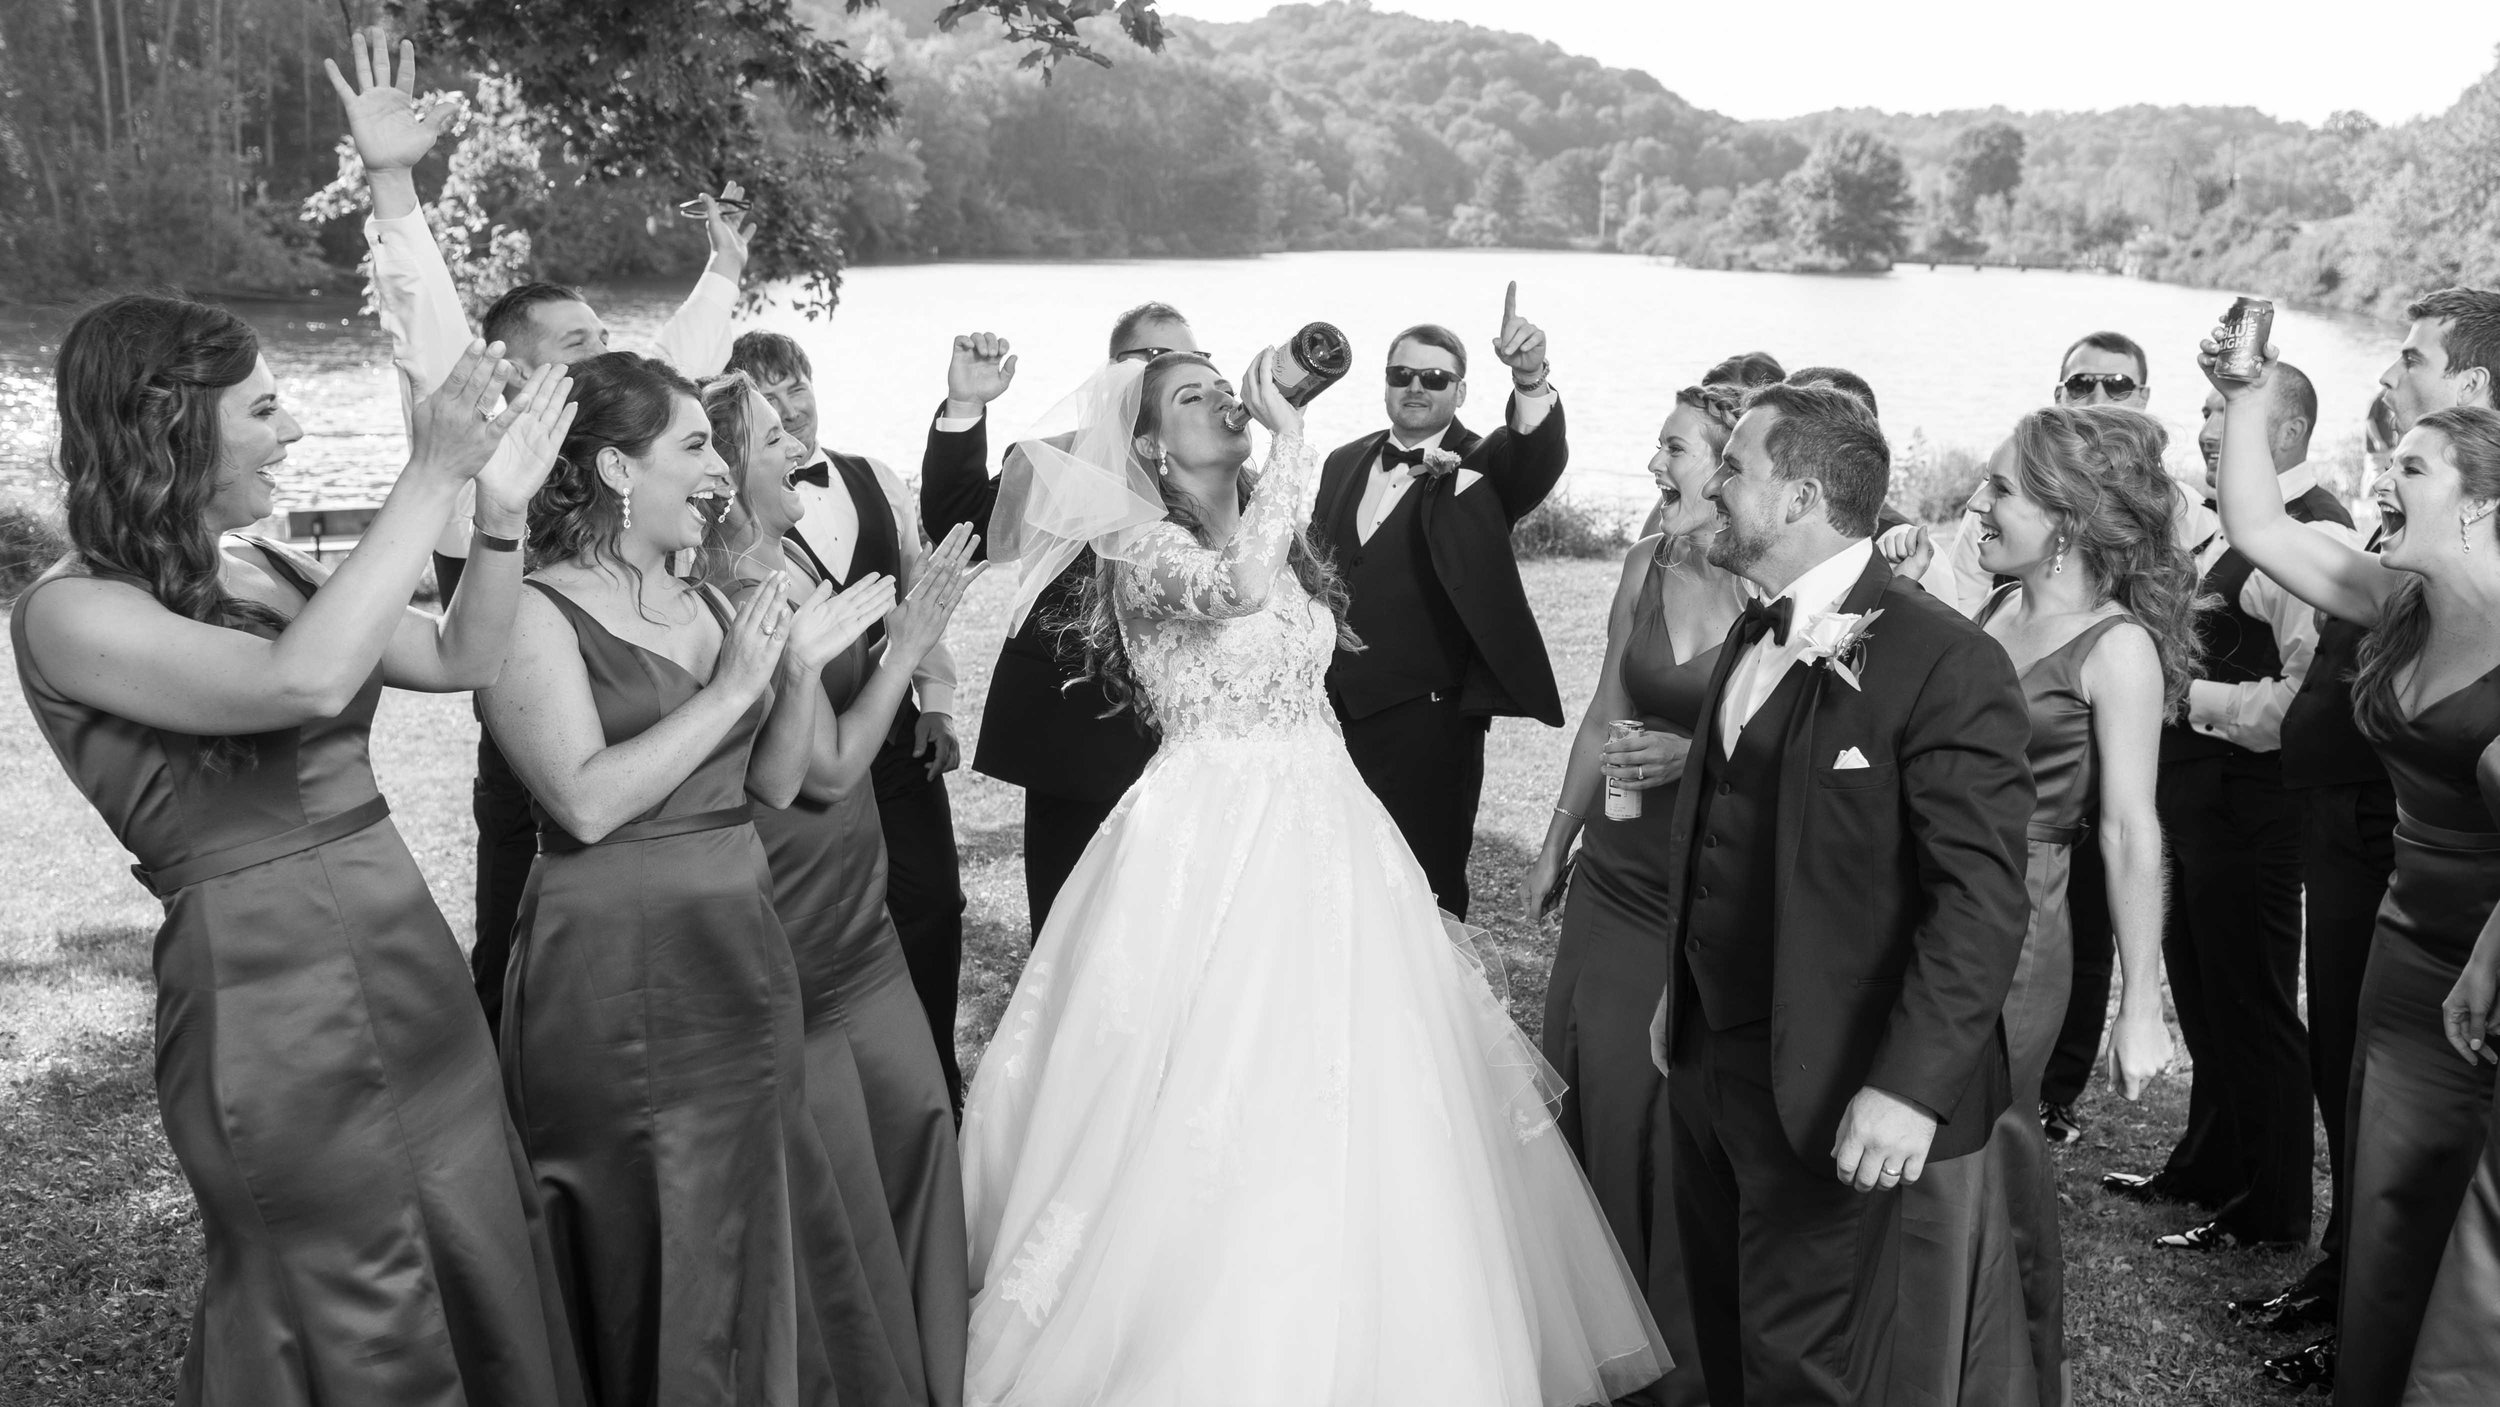 Wedding-North-Park-Bridal-Party-Portraits-12.jpg